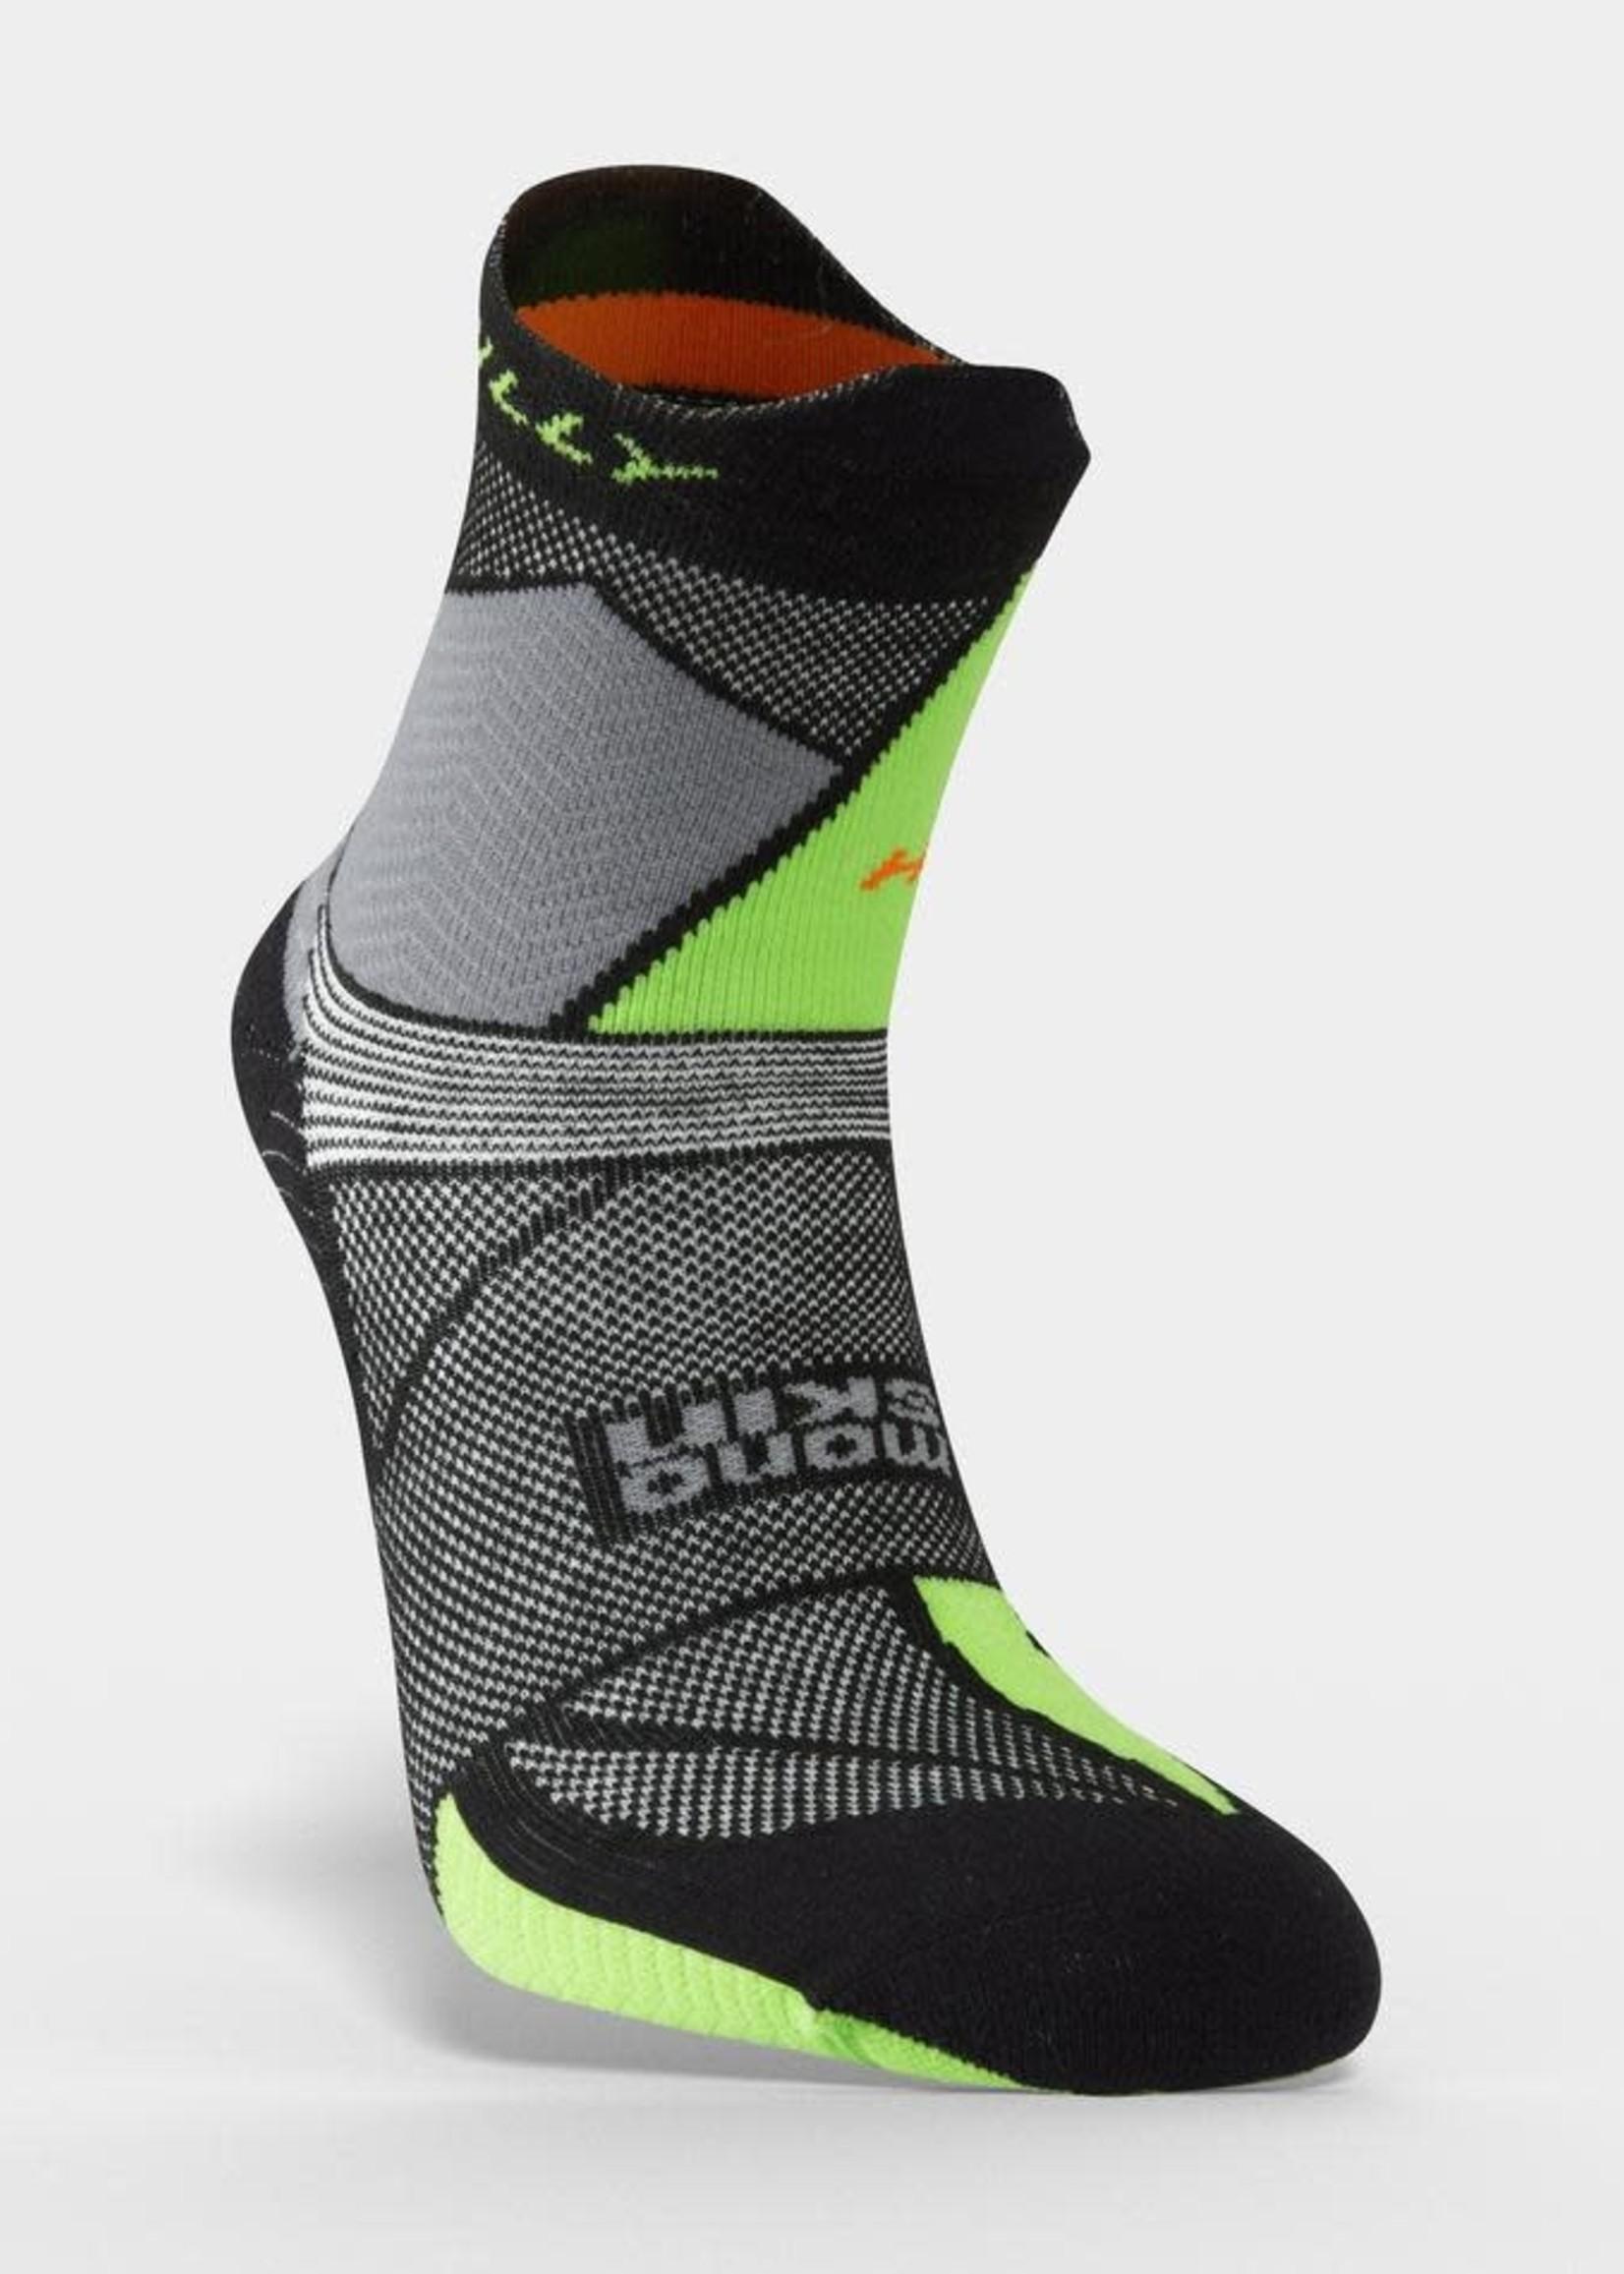 Hilly Hilly Ultra Marathon Fresh Socks